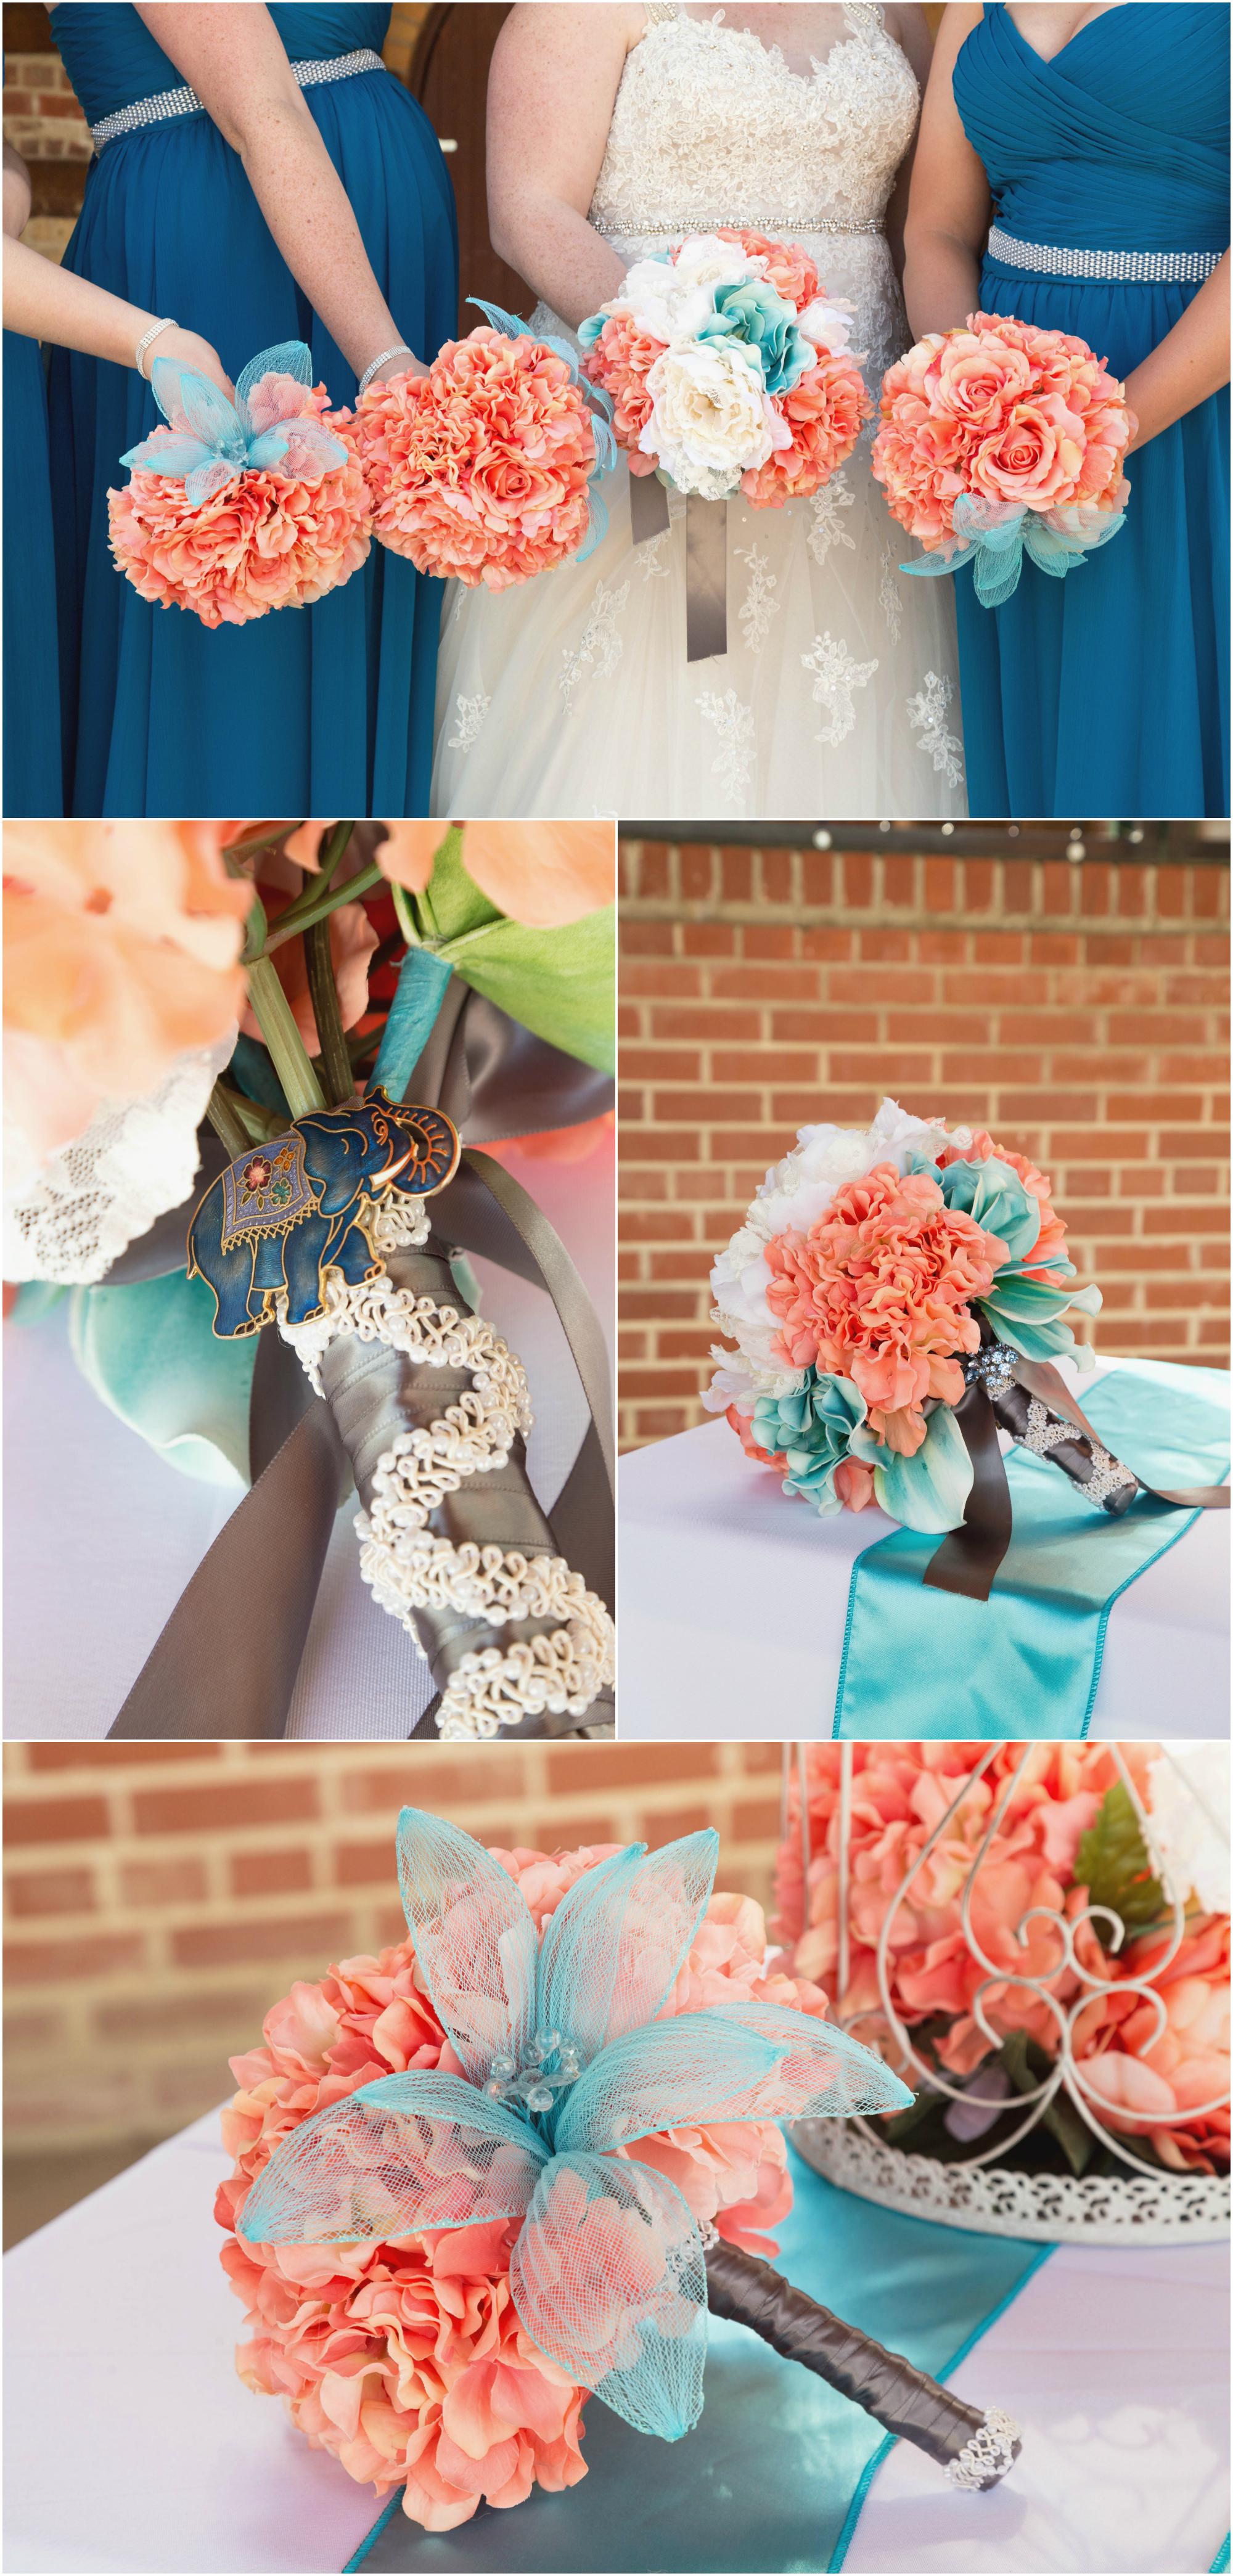 medalta_wedding_medicine_hat_10.png